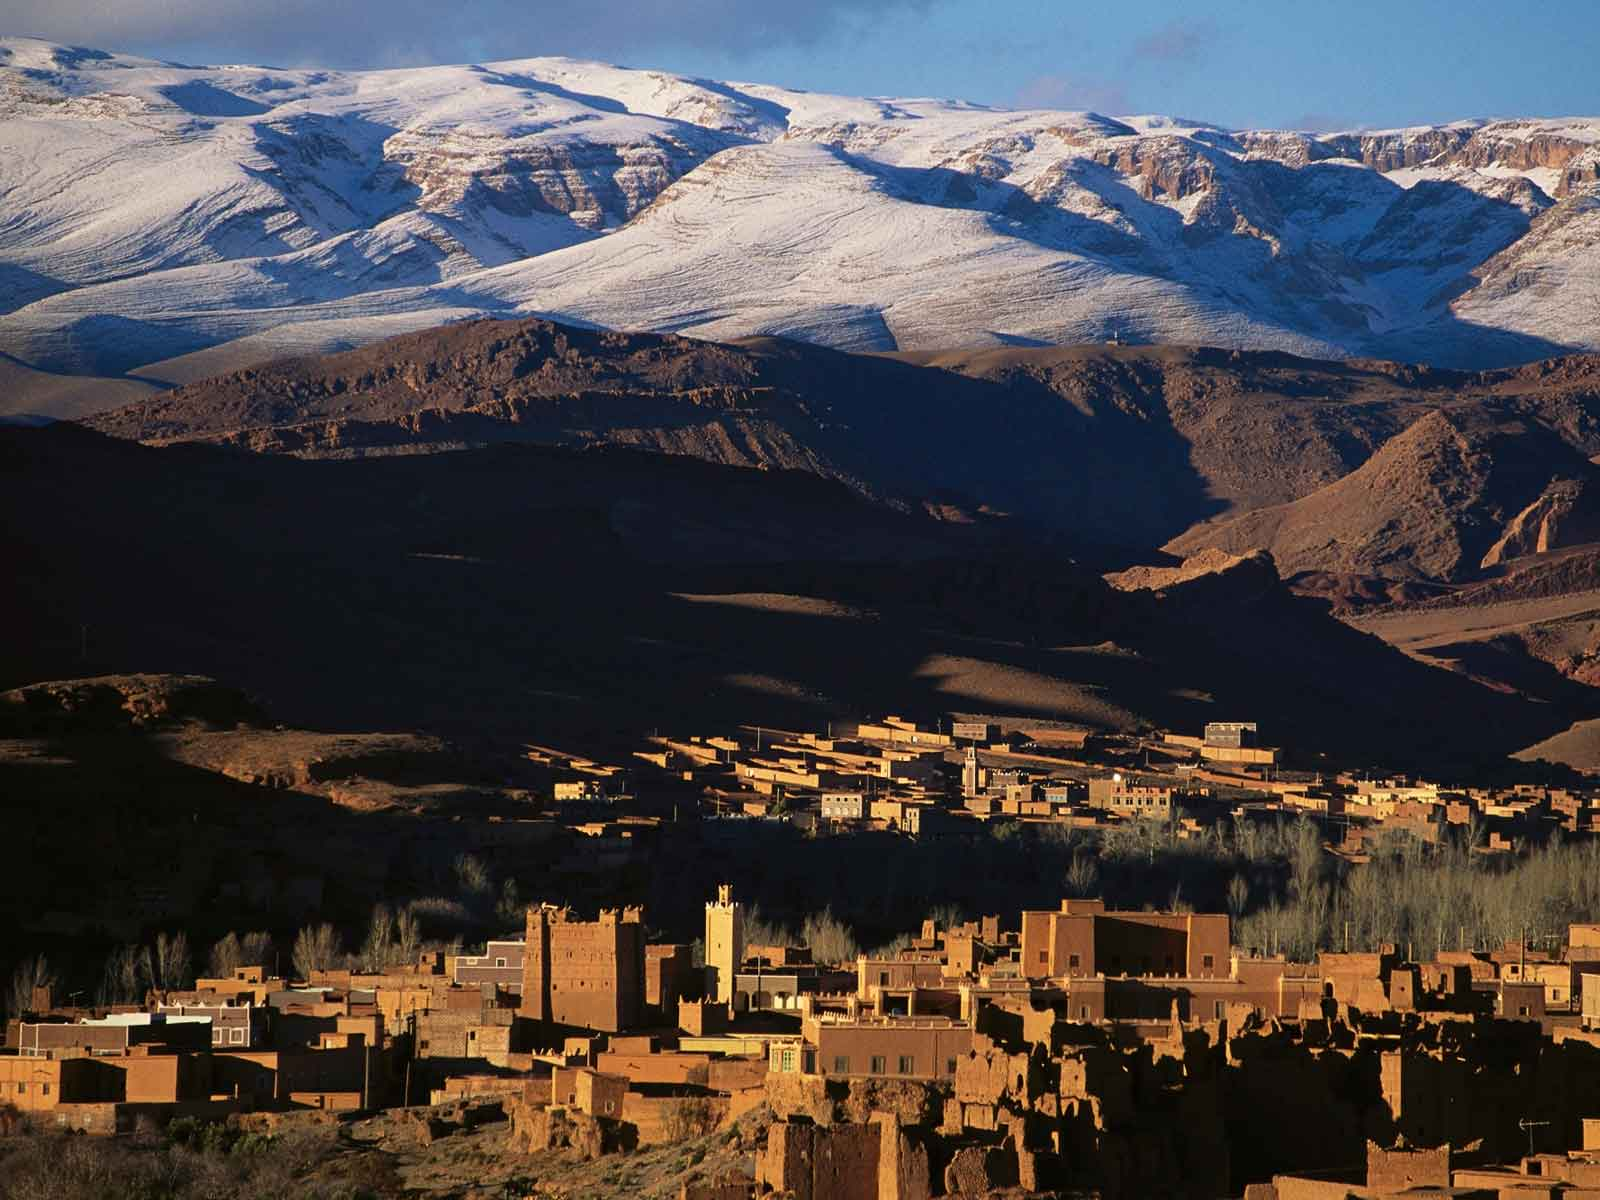 Morocco Sahara desert tour from Fez to Marrakech